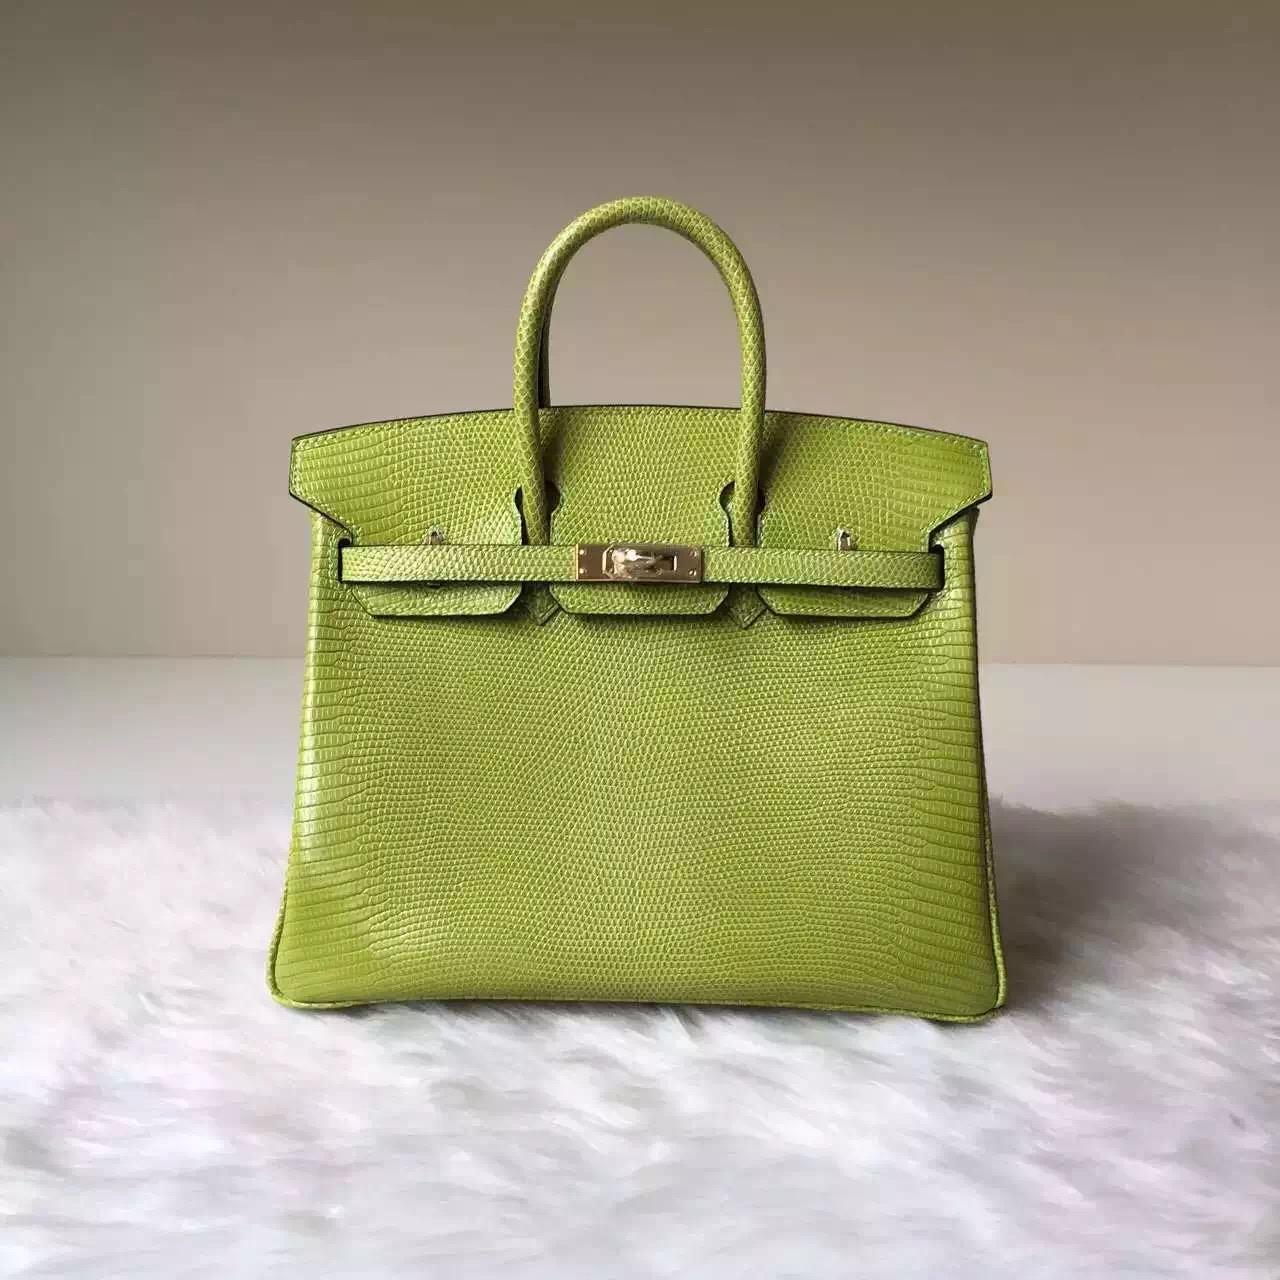 New Hermes 6R Kiwi Color Shiny Lizard Leather Birkin Bag25cm